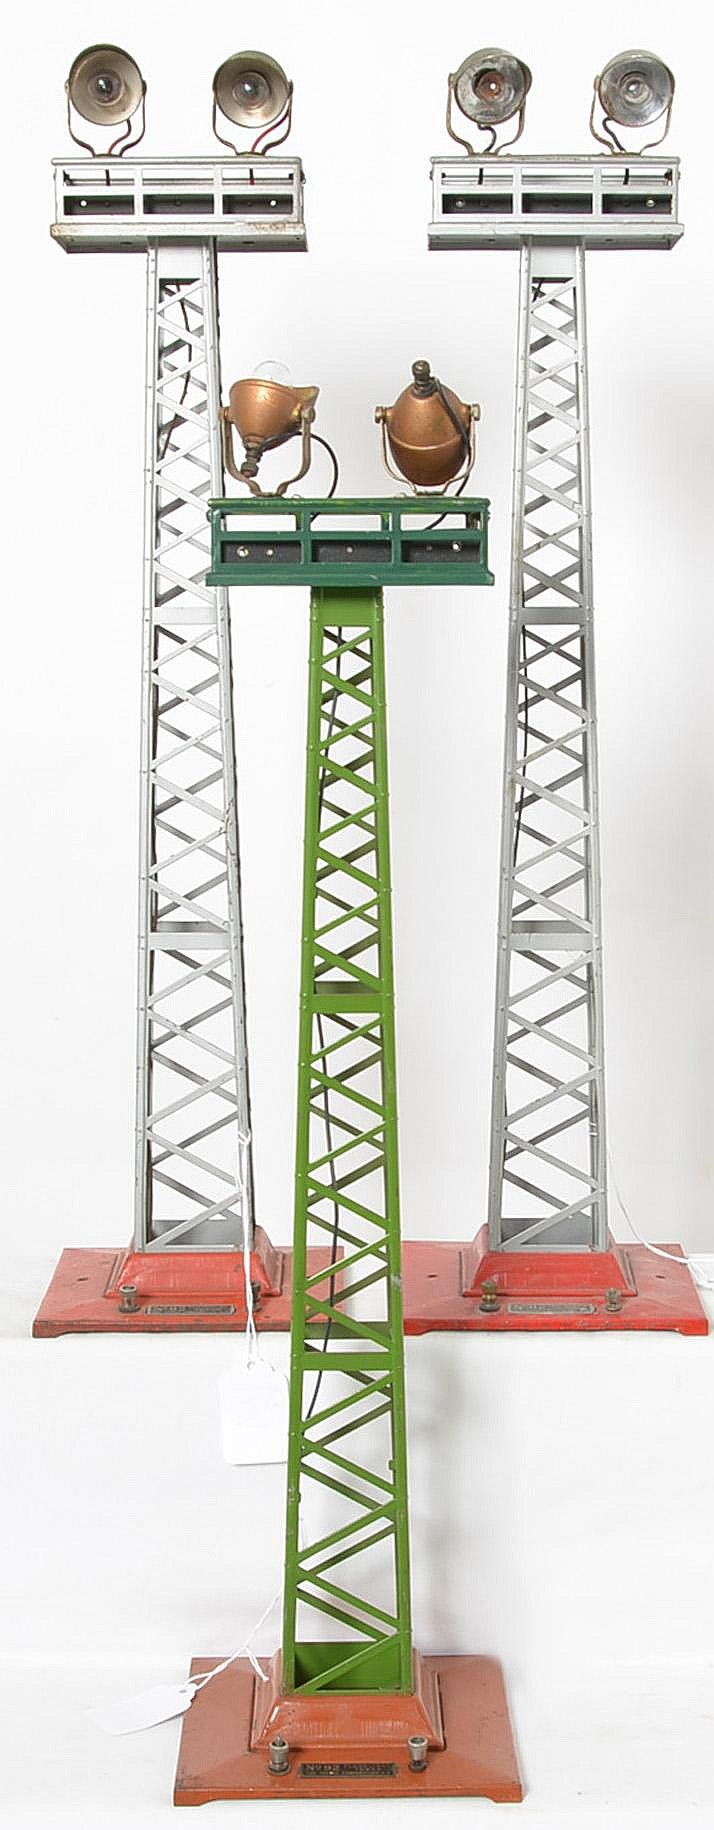 3 Lionel standard gauge No. 92 floodlight towers